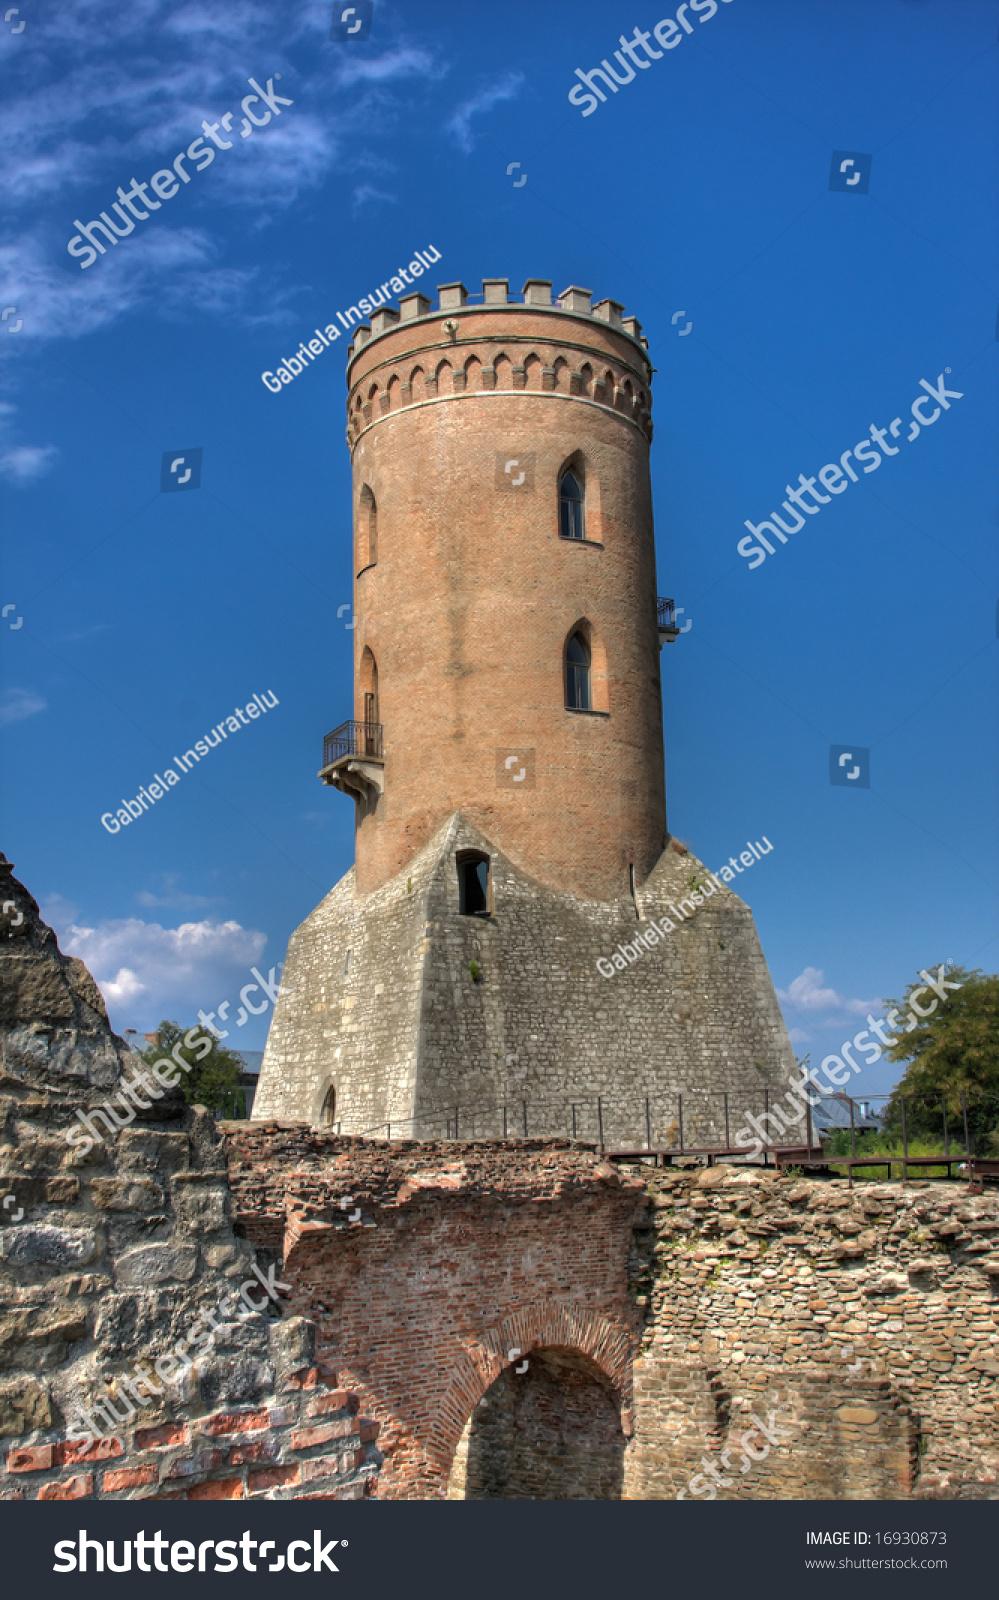 Targoviste Ruins With Chindia Tower Stock Photo - Image of ...  |Chindia